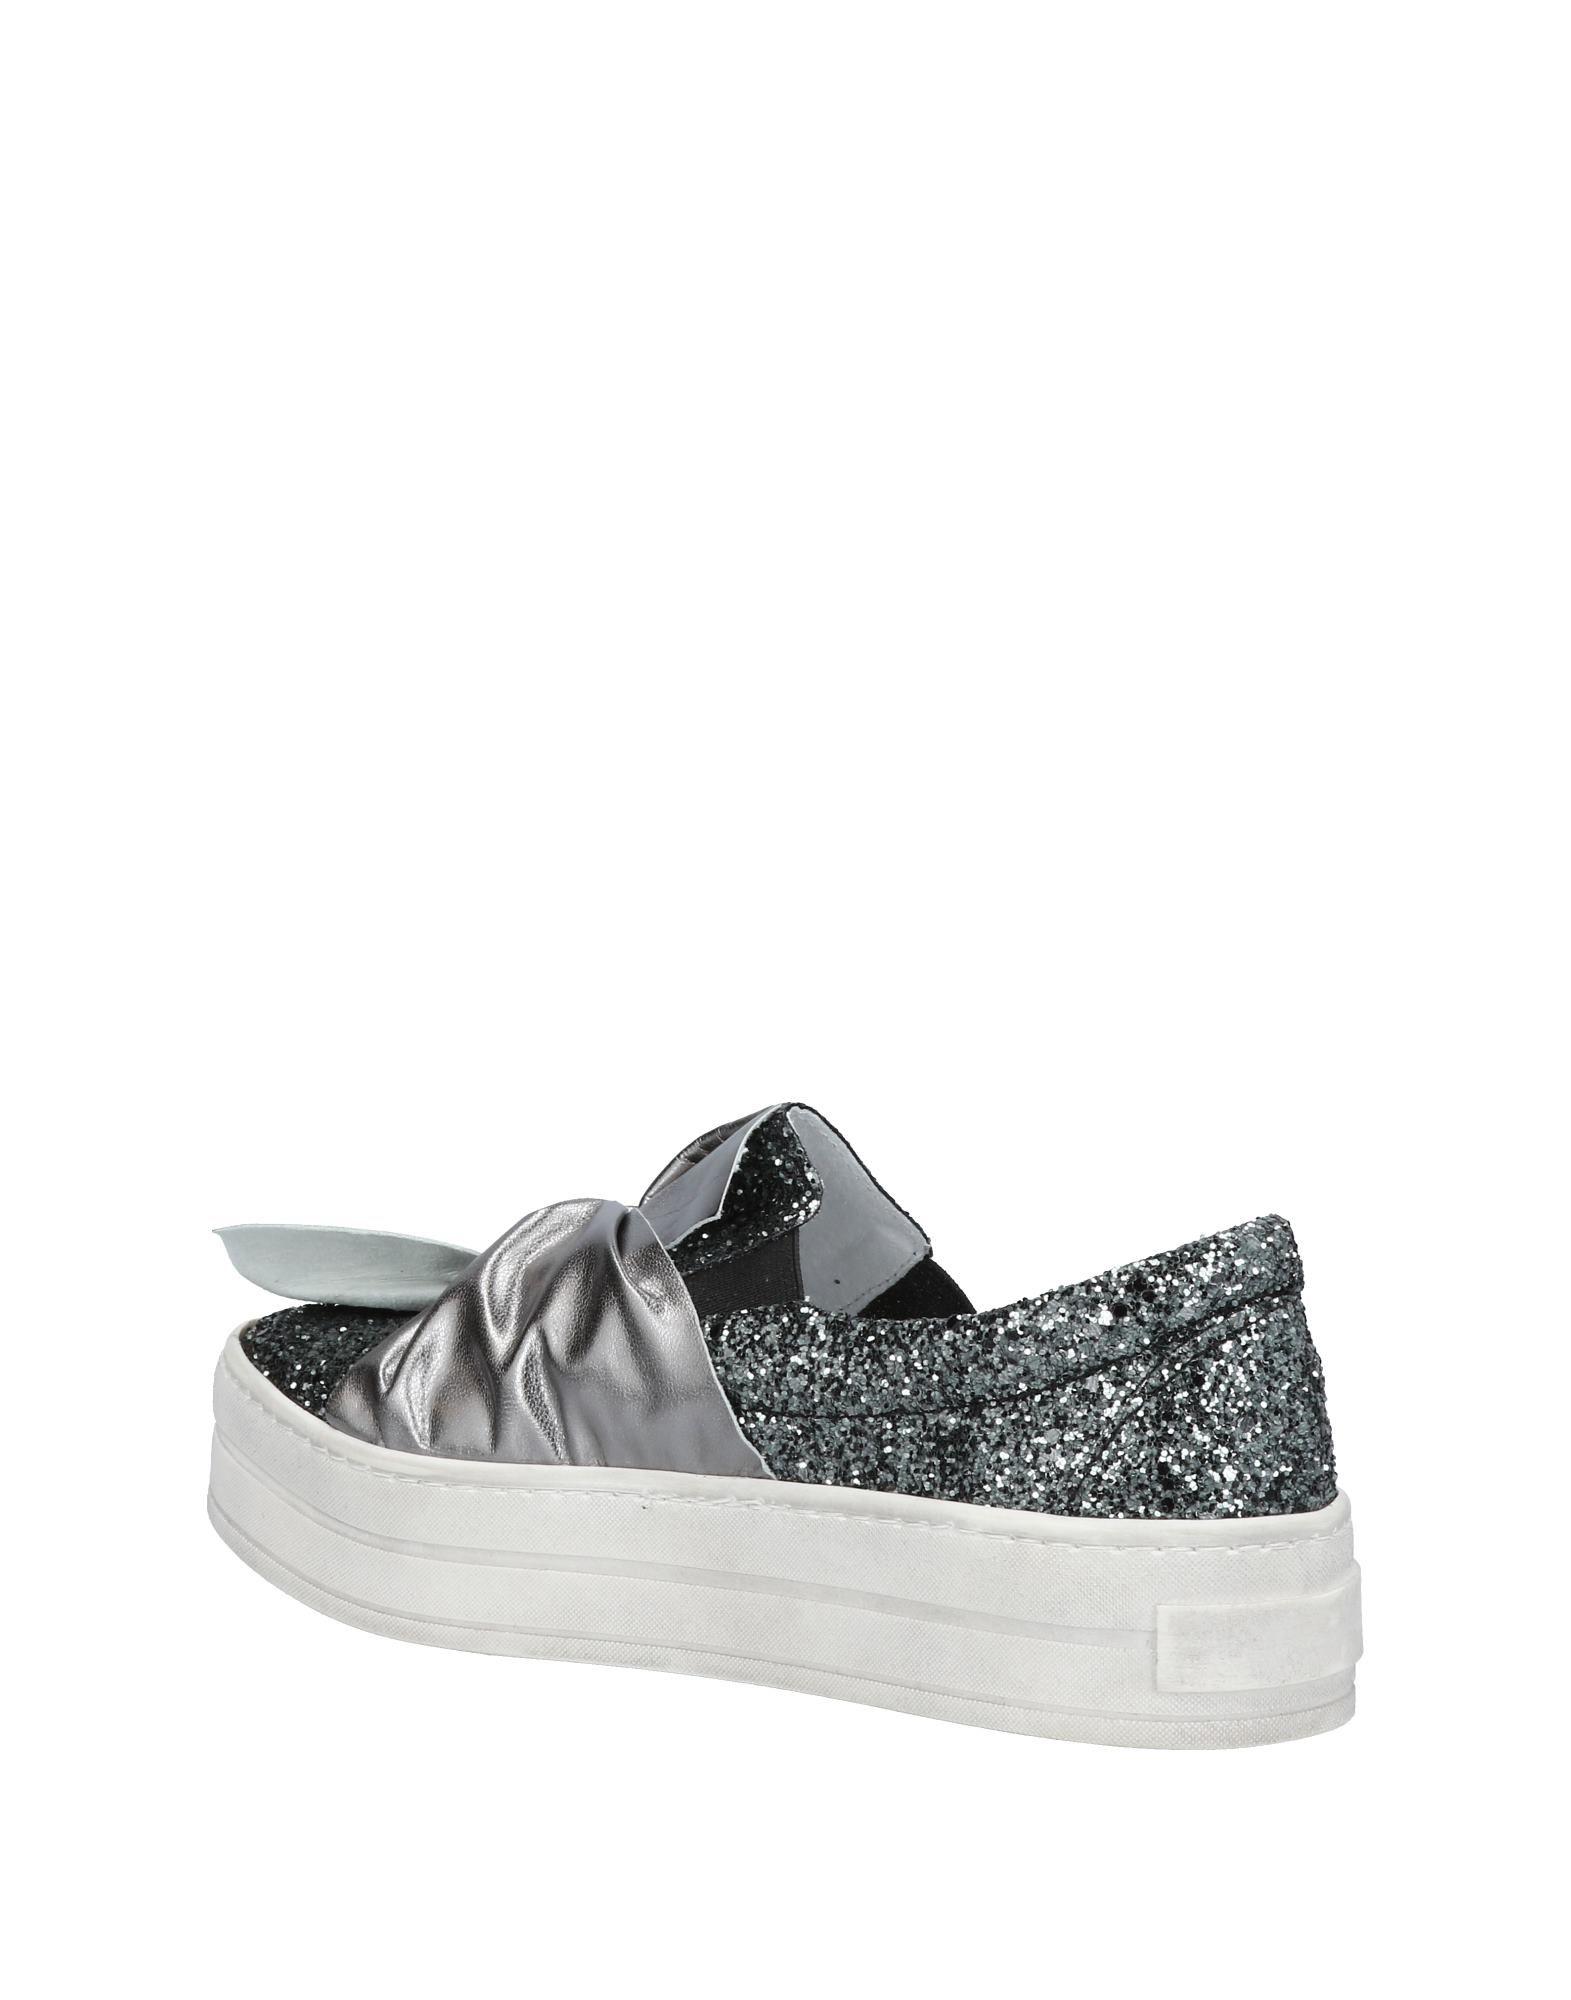 Manuela Dardozzi Sneakers Schuhe Damen  11423449EQ Gute Qualität beliebte Schuhe Sneakers 71cc23